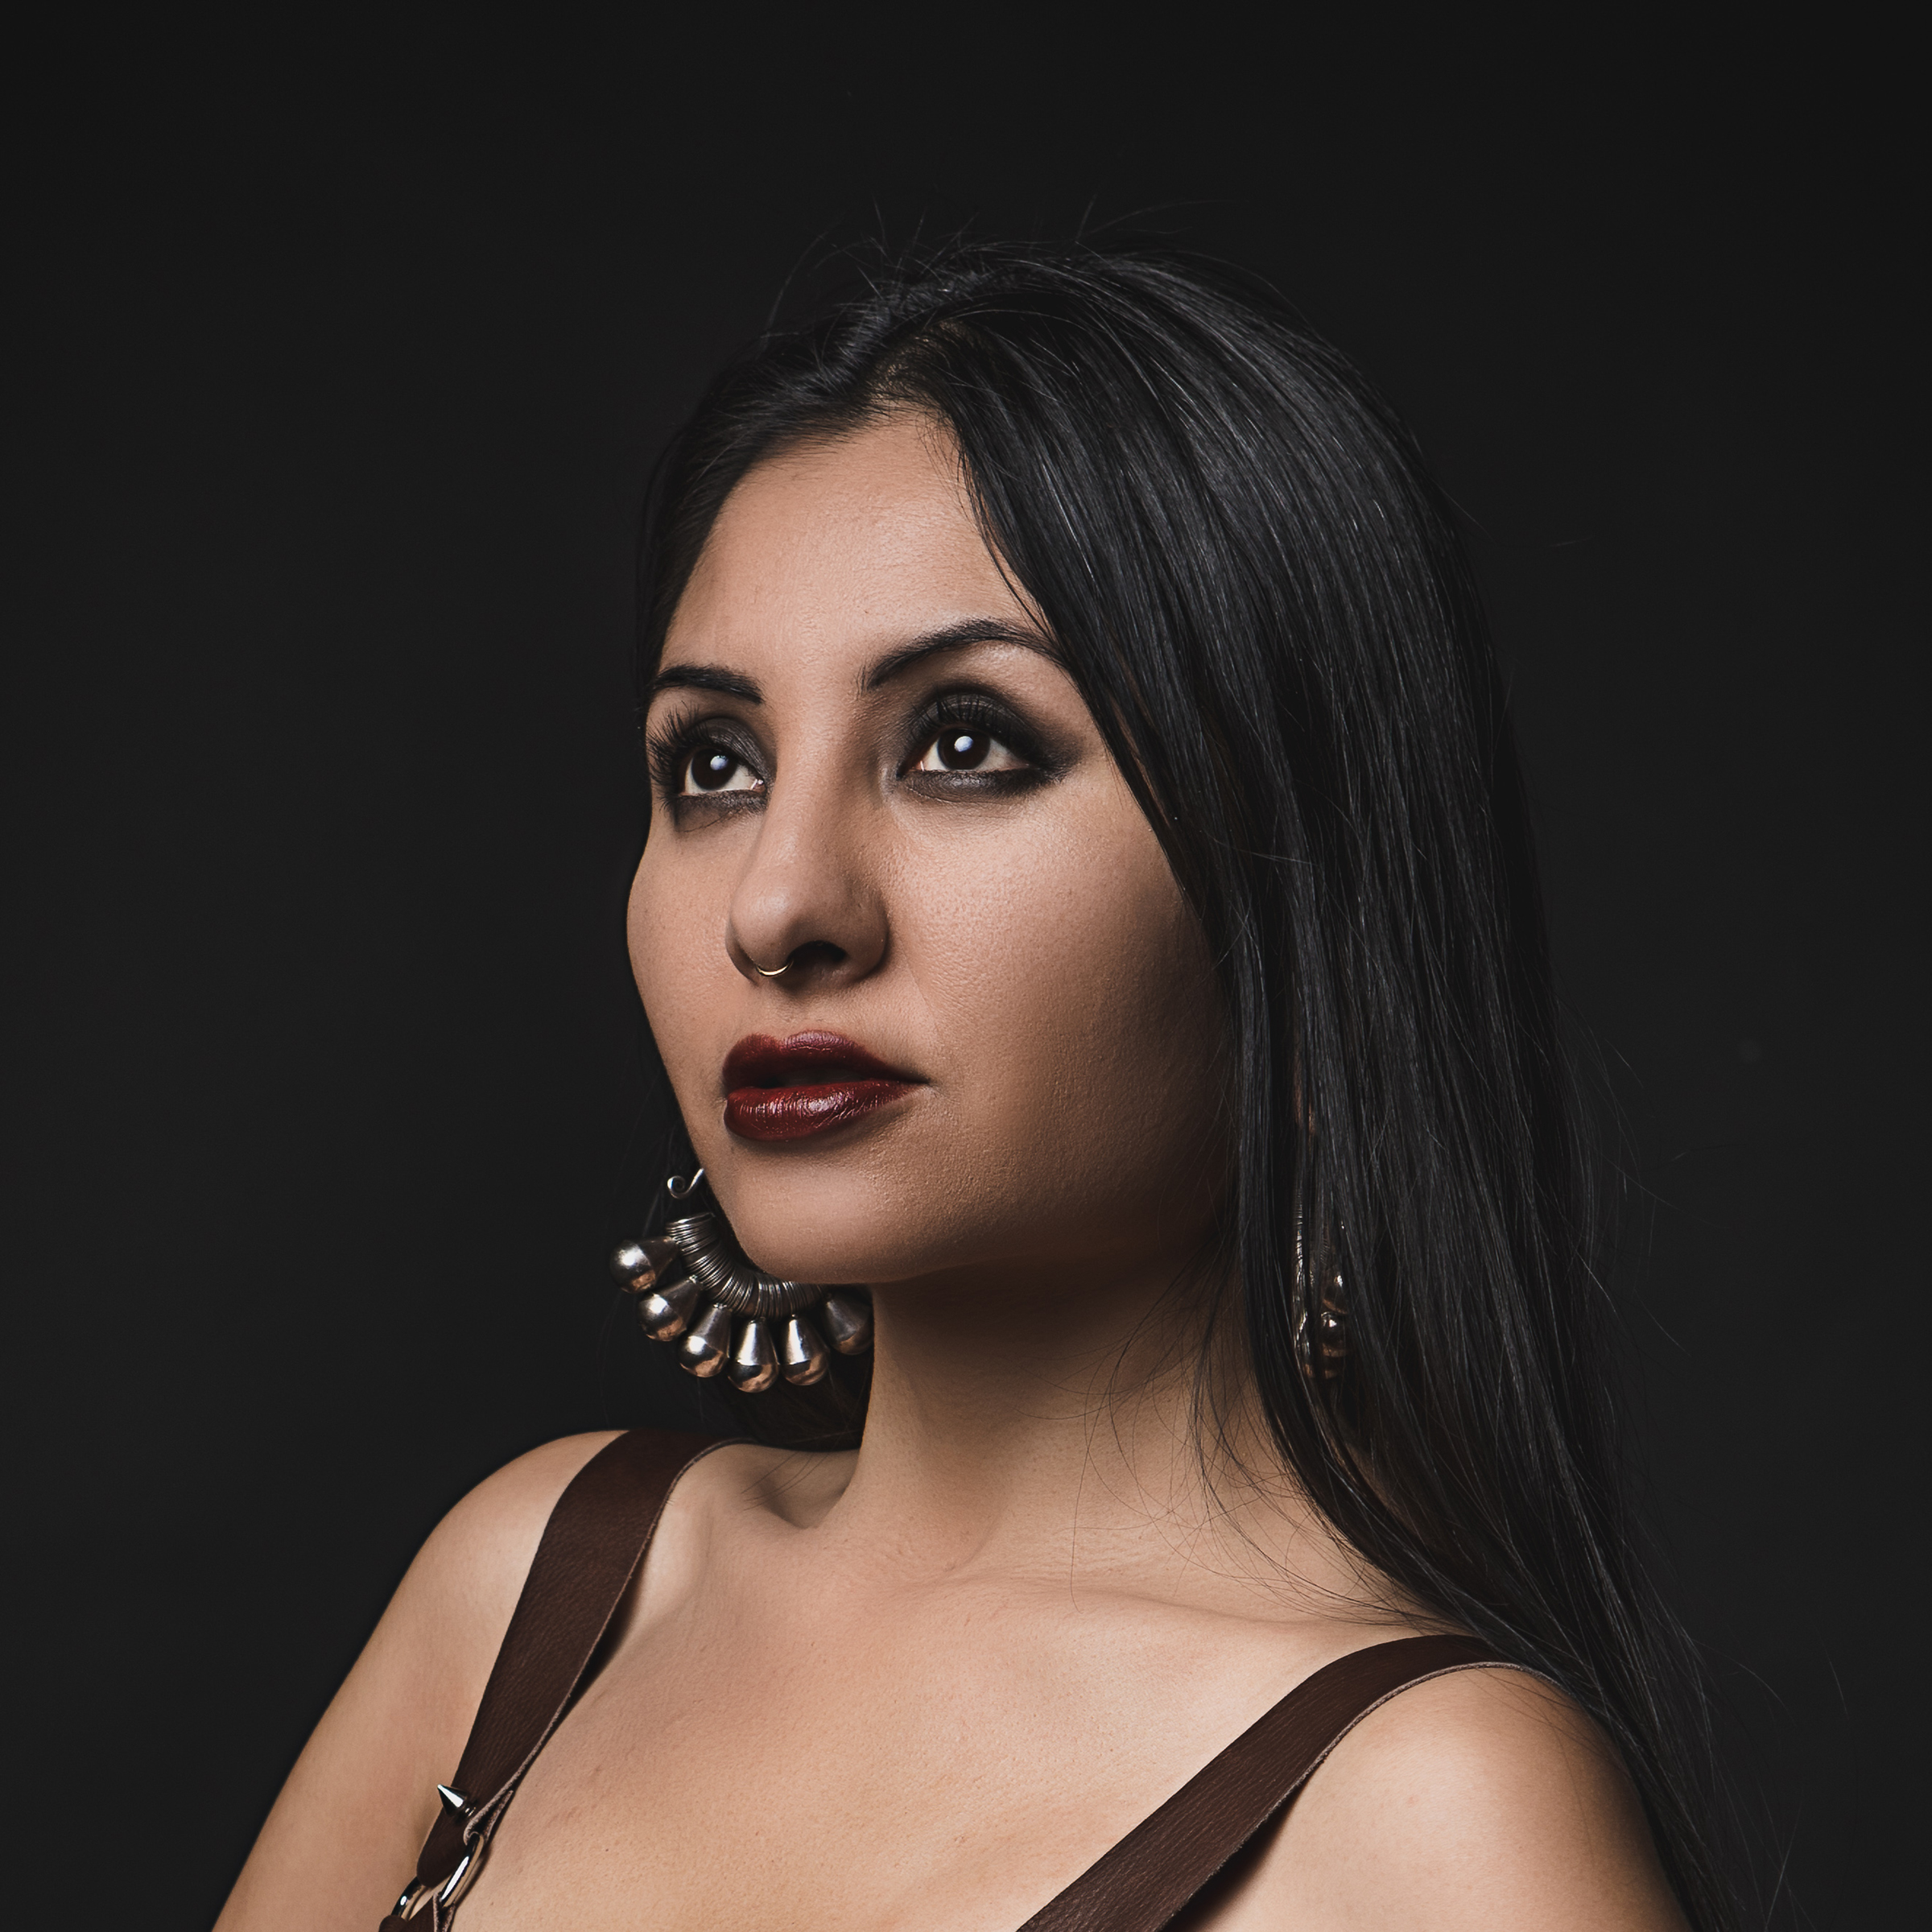 Luna Duran